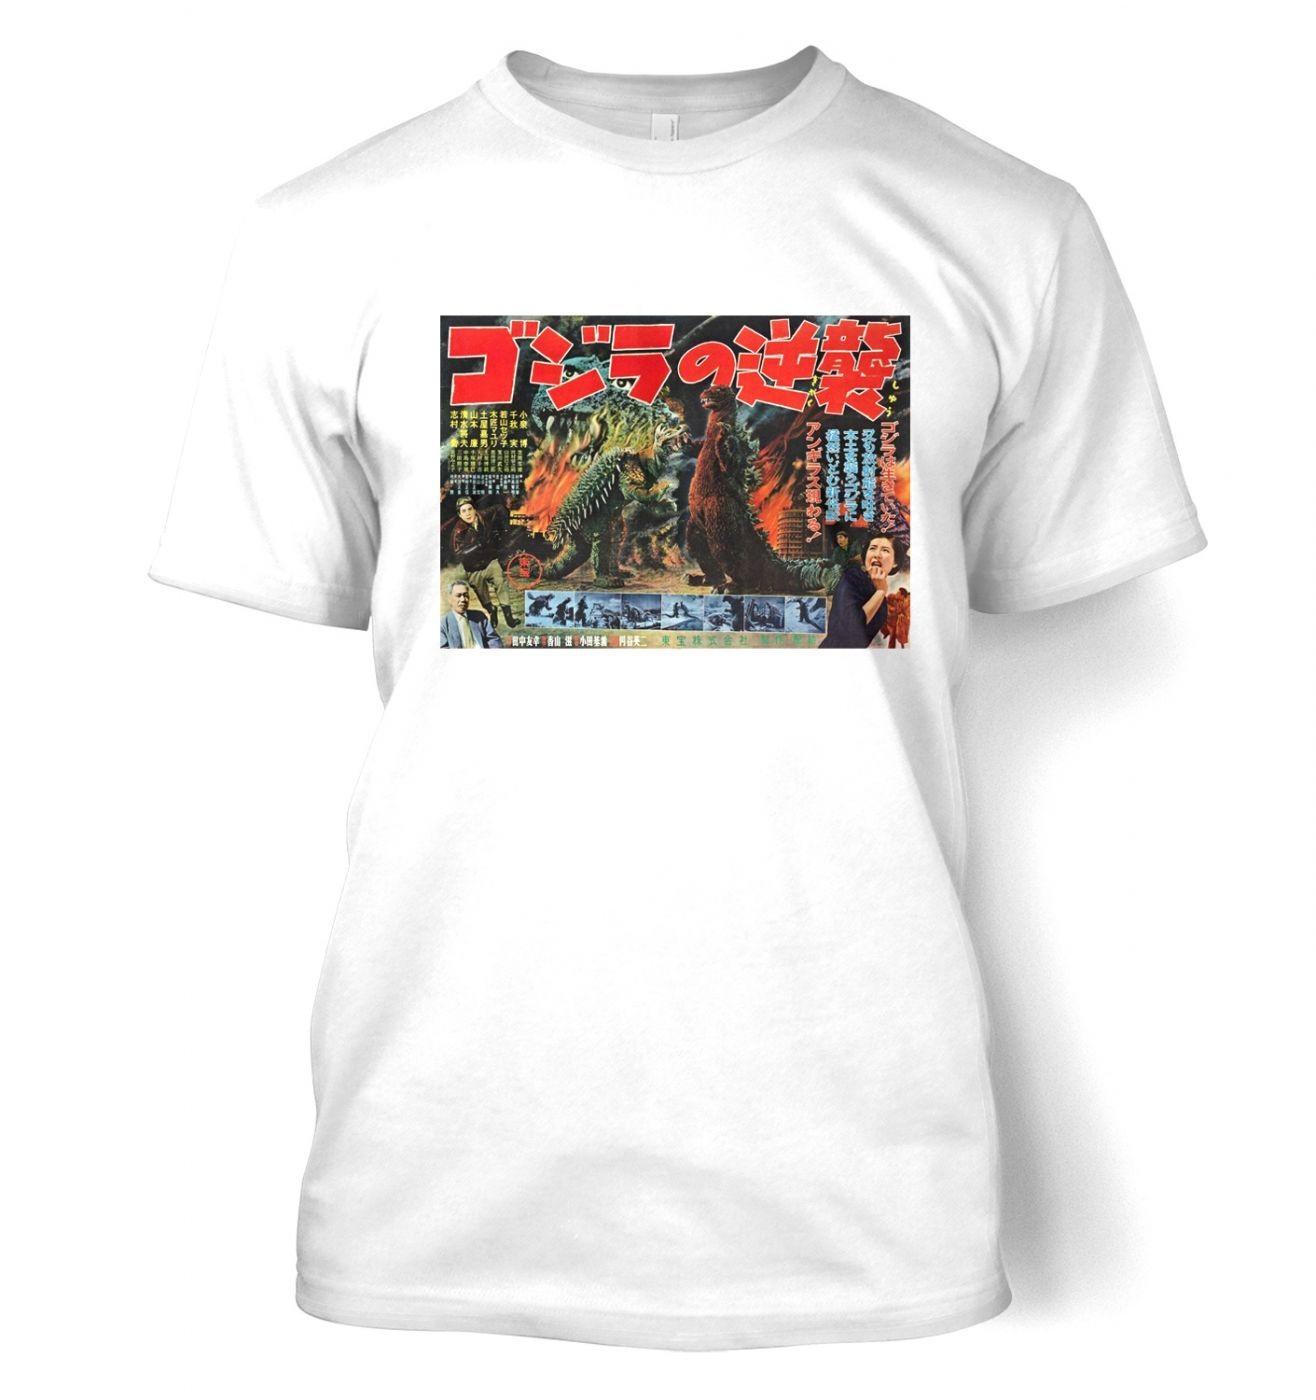 Godzilla Raids Again men's t-shirt